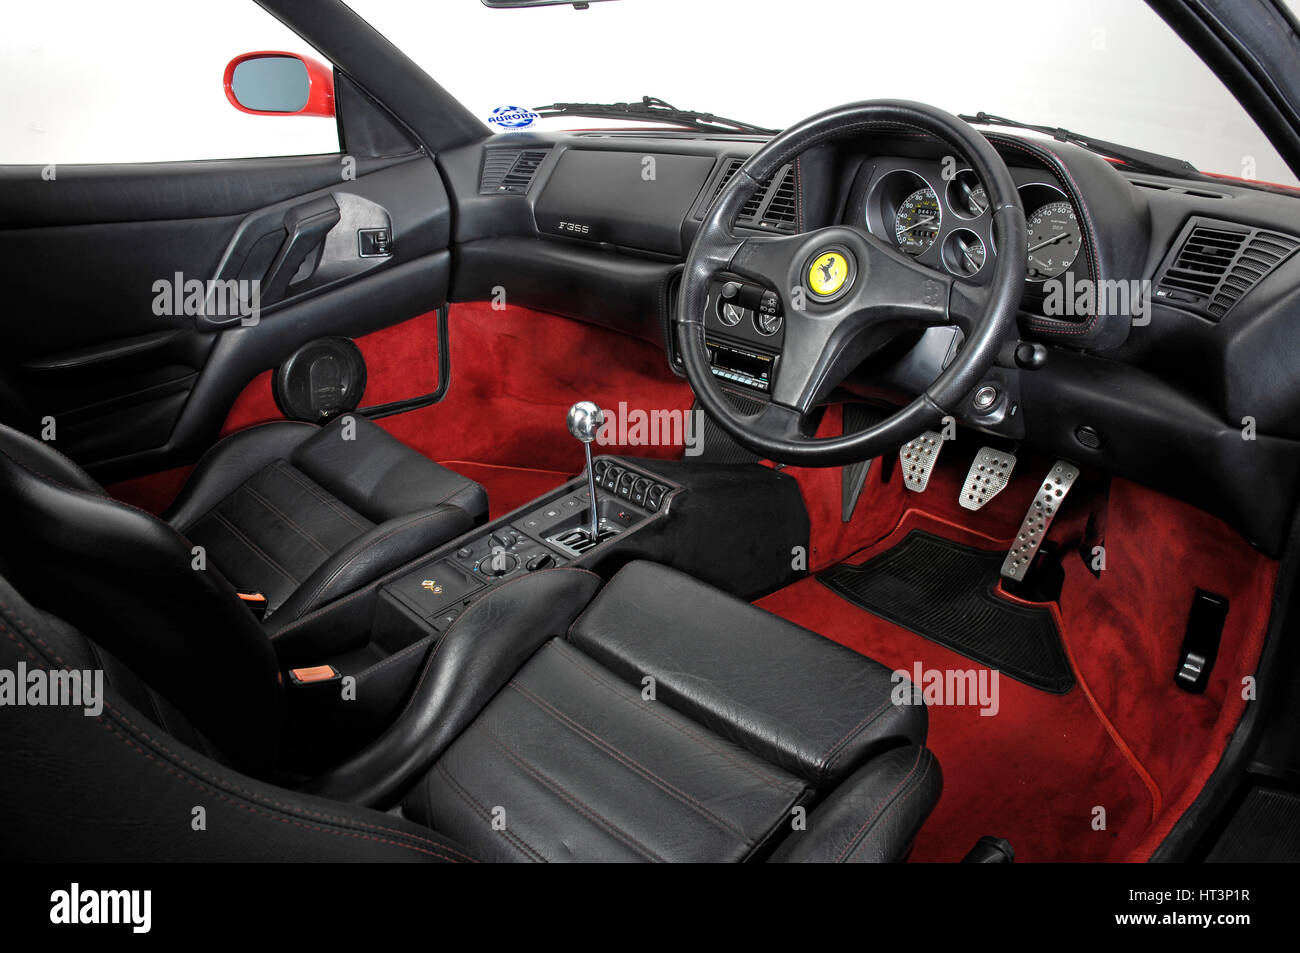 1994 Ferrari F355 Berlinetta Interior Artist Unknown Stock Photo Alamy